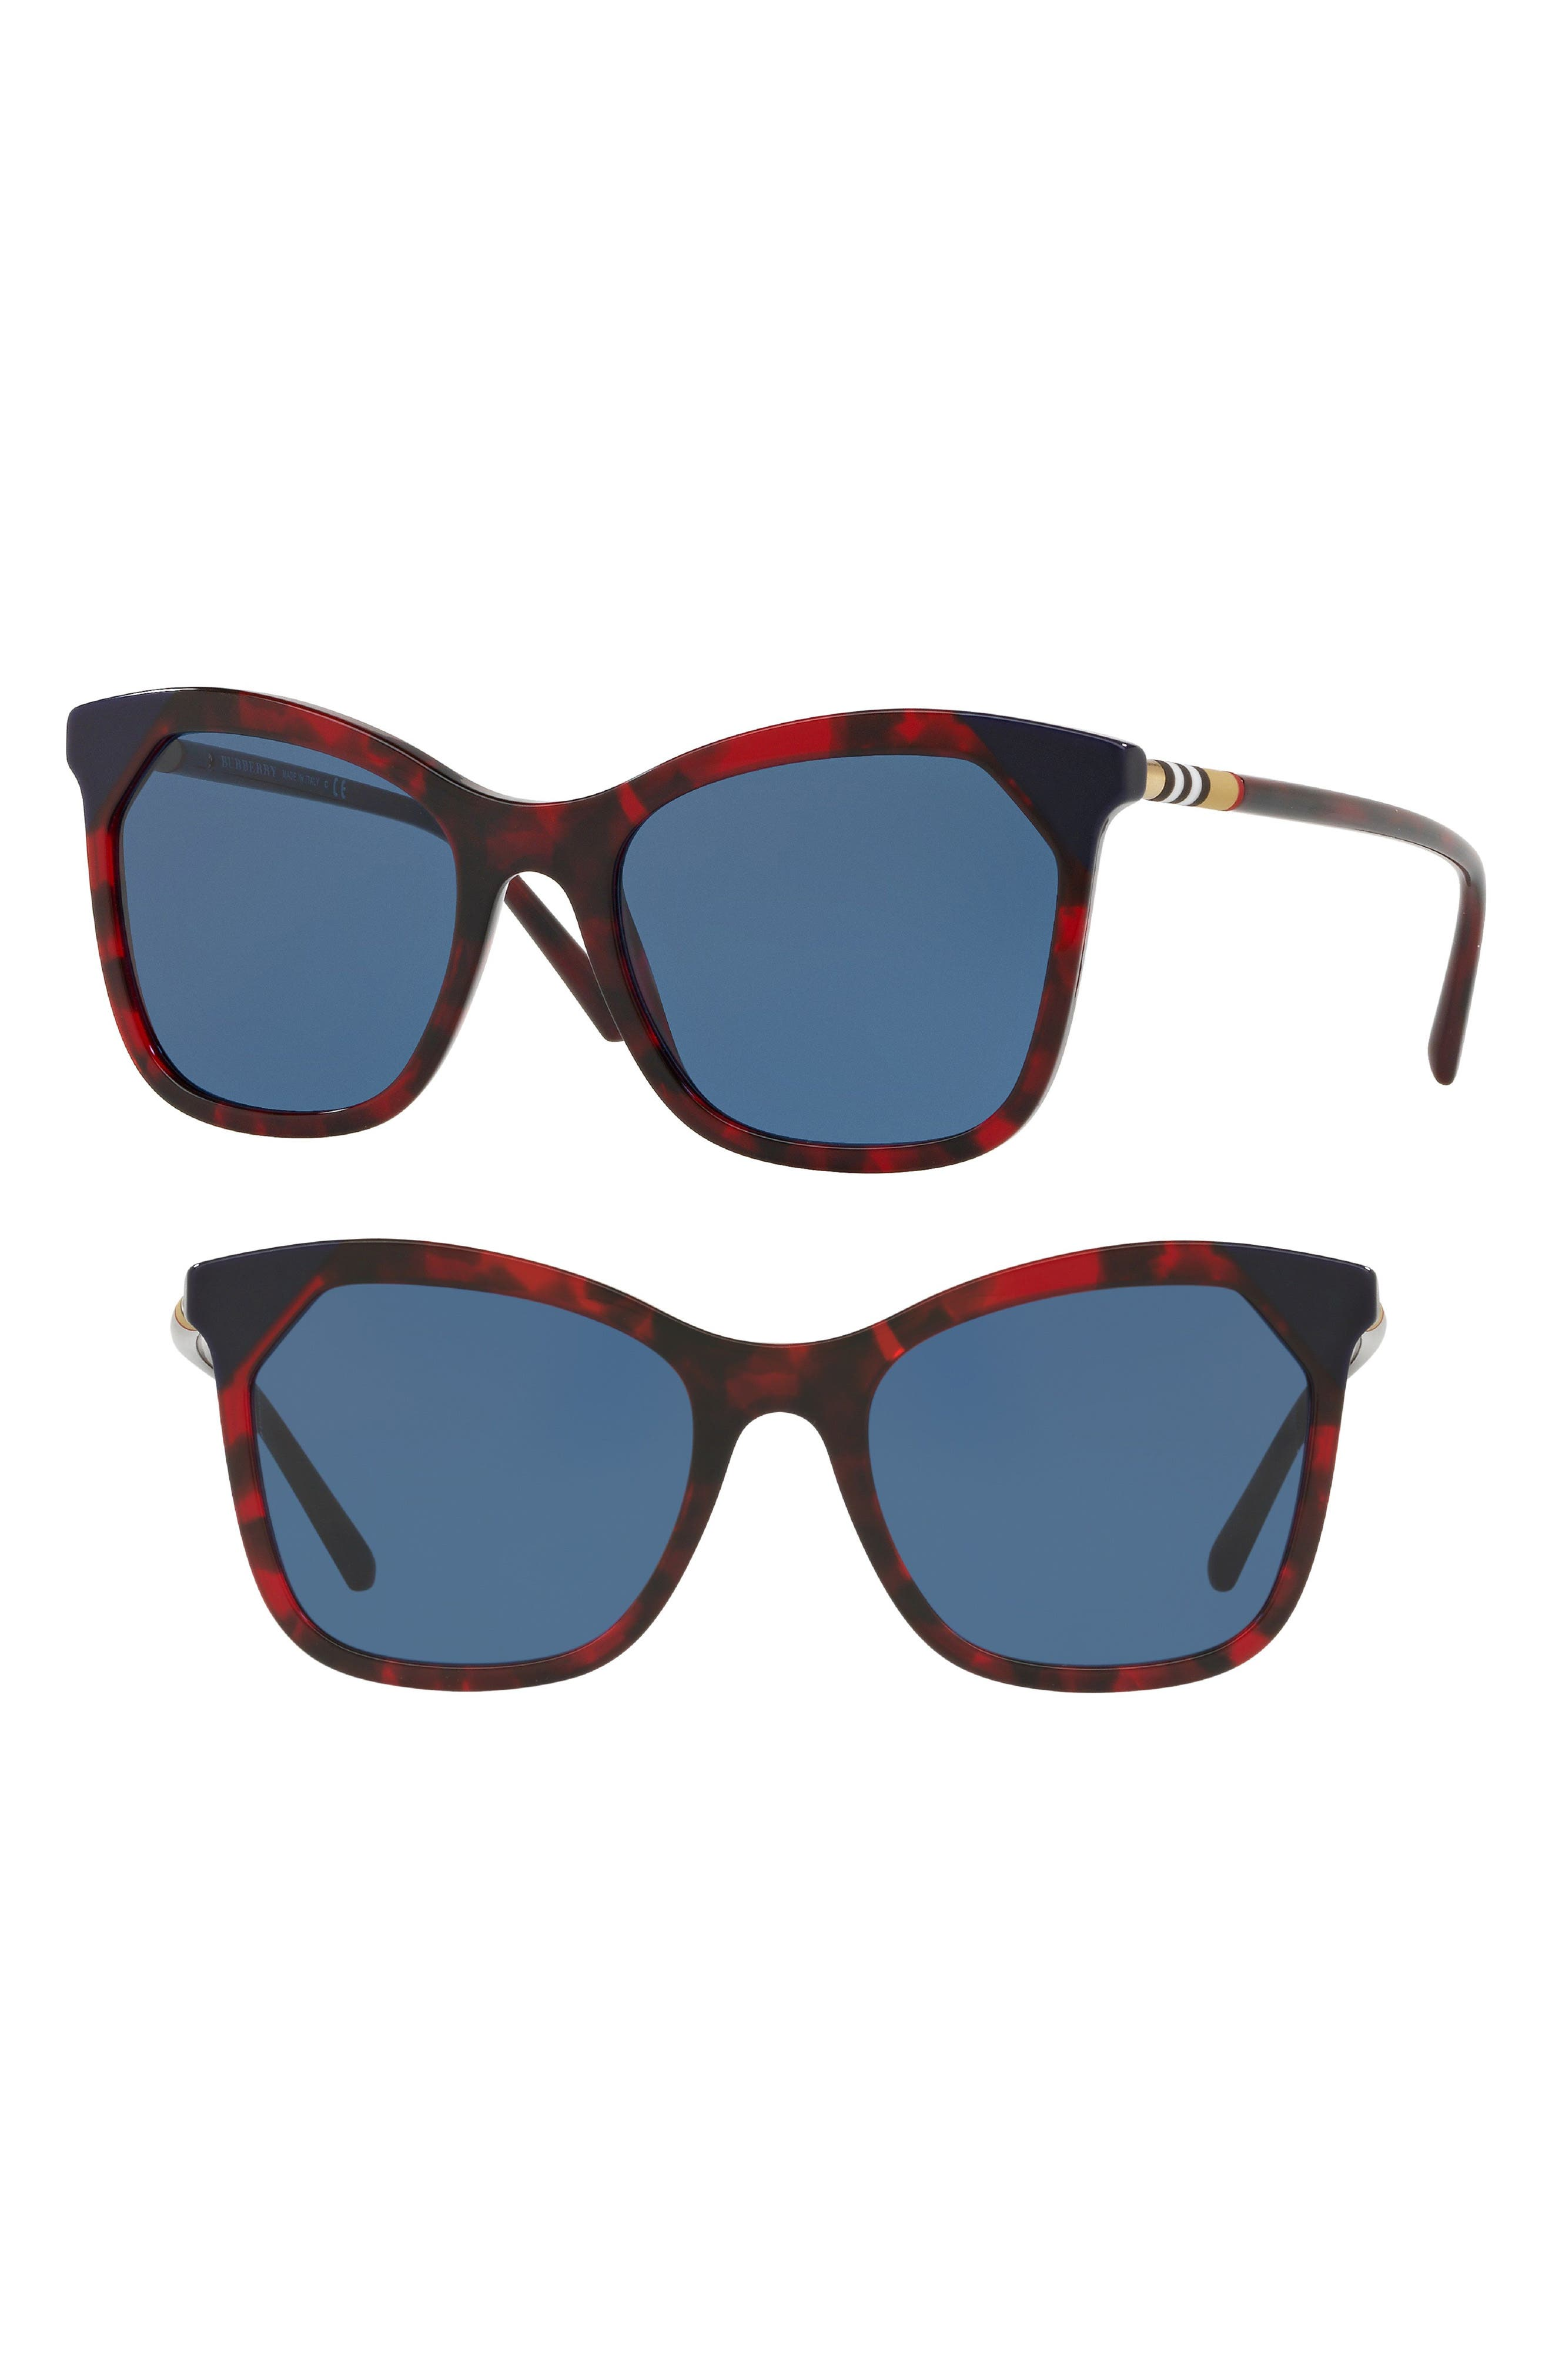 Heritage 54mm Square Sunglasses,                             Main thumbnail 5, color,